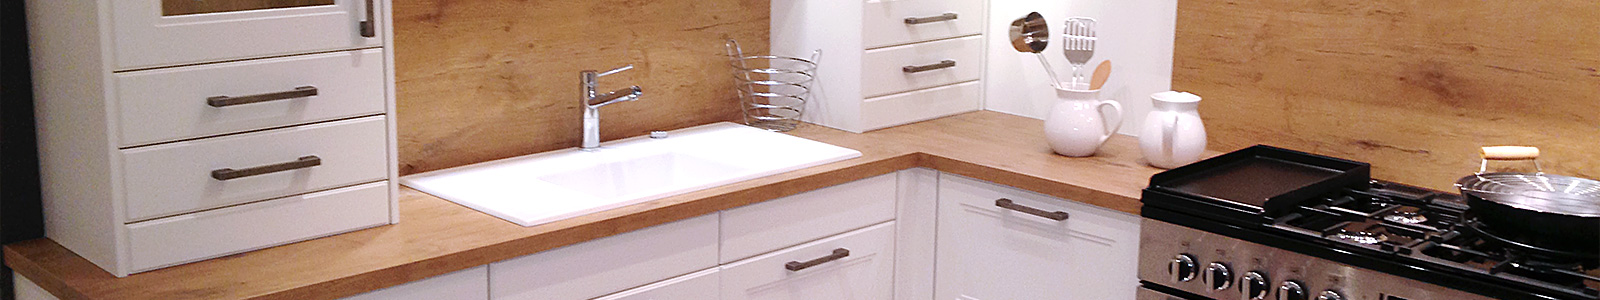 Küchen Bad Homburg küchen in bad homburg küchen kre